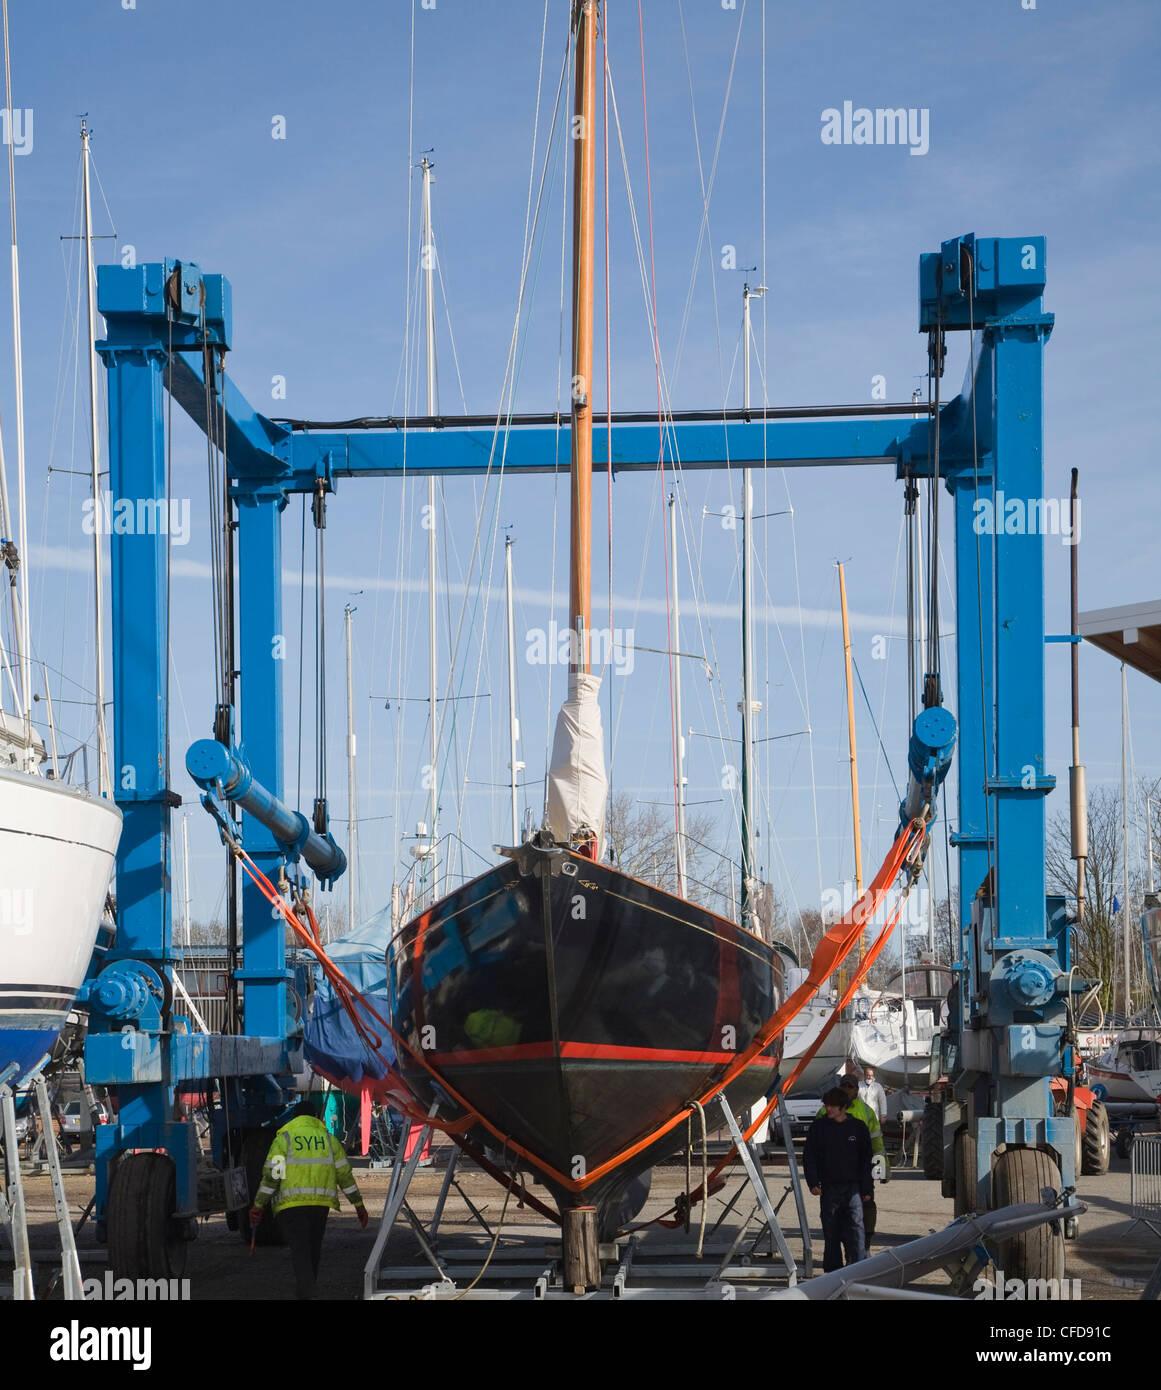 Boatyard and boat crane Levington marina, Suffolk, - Stock Image